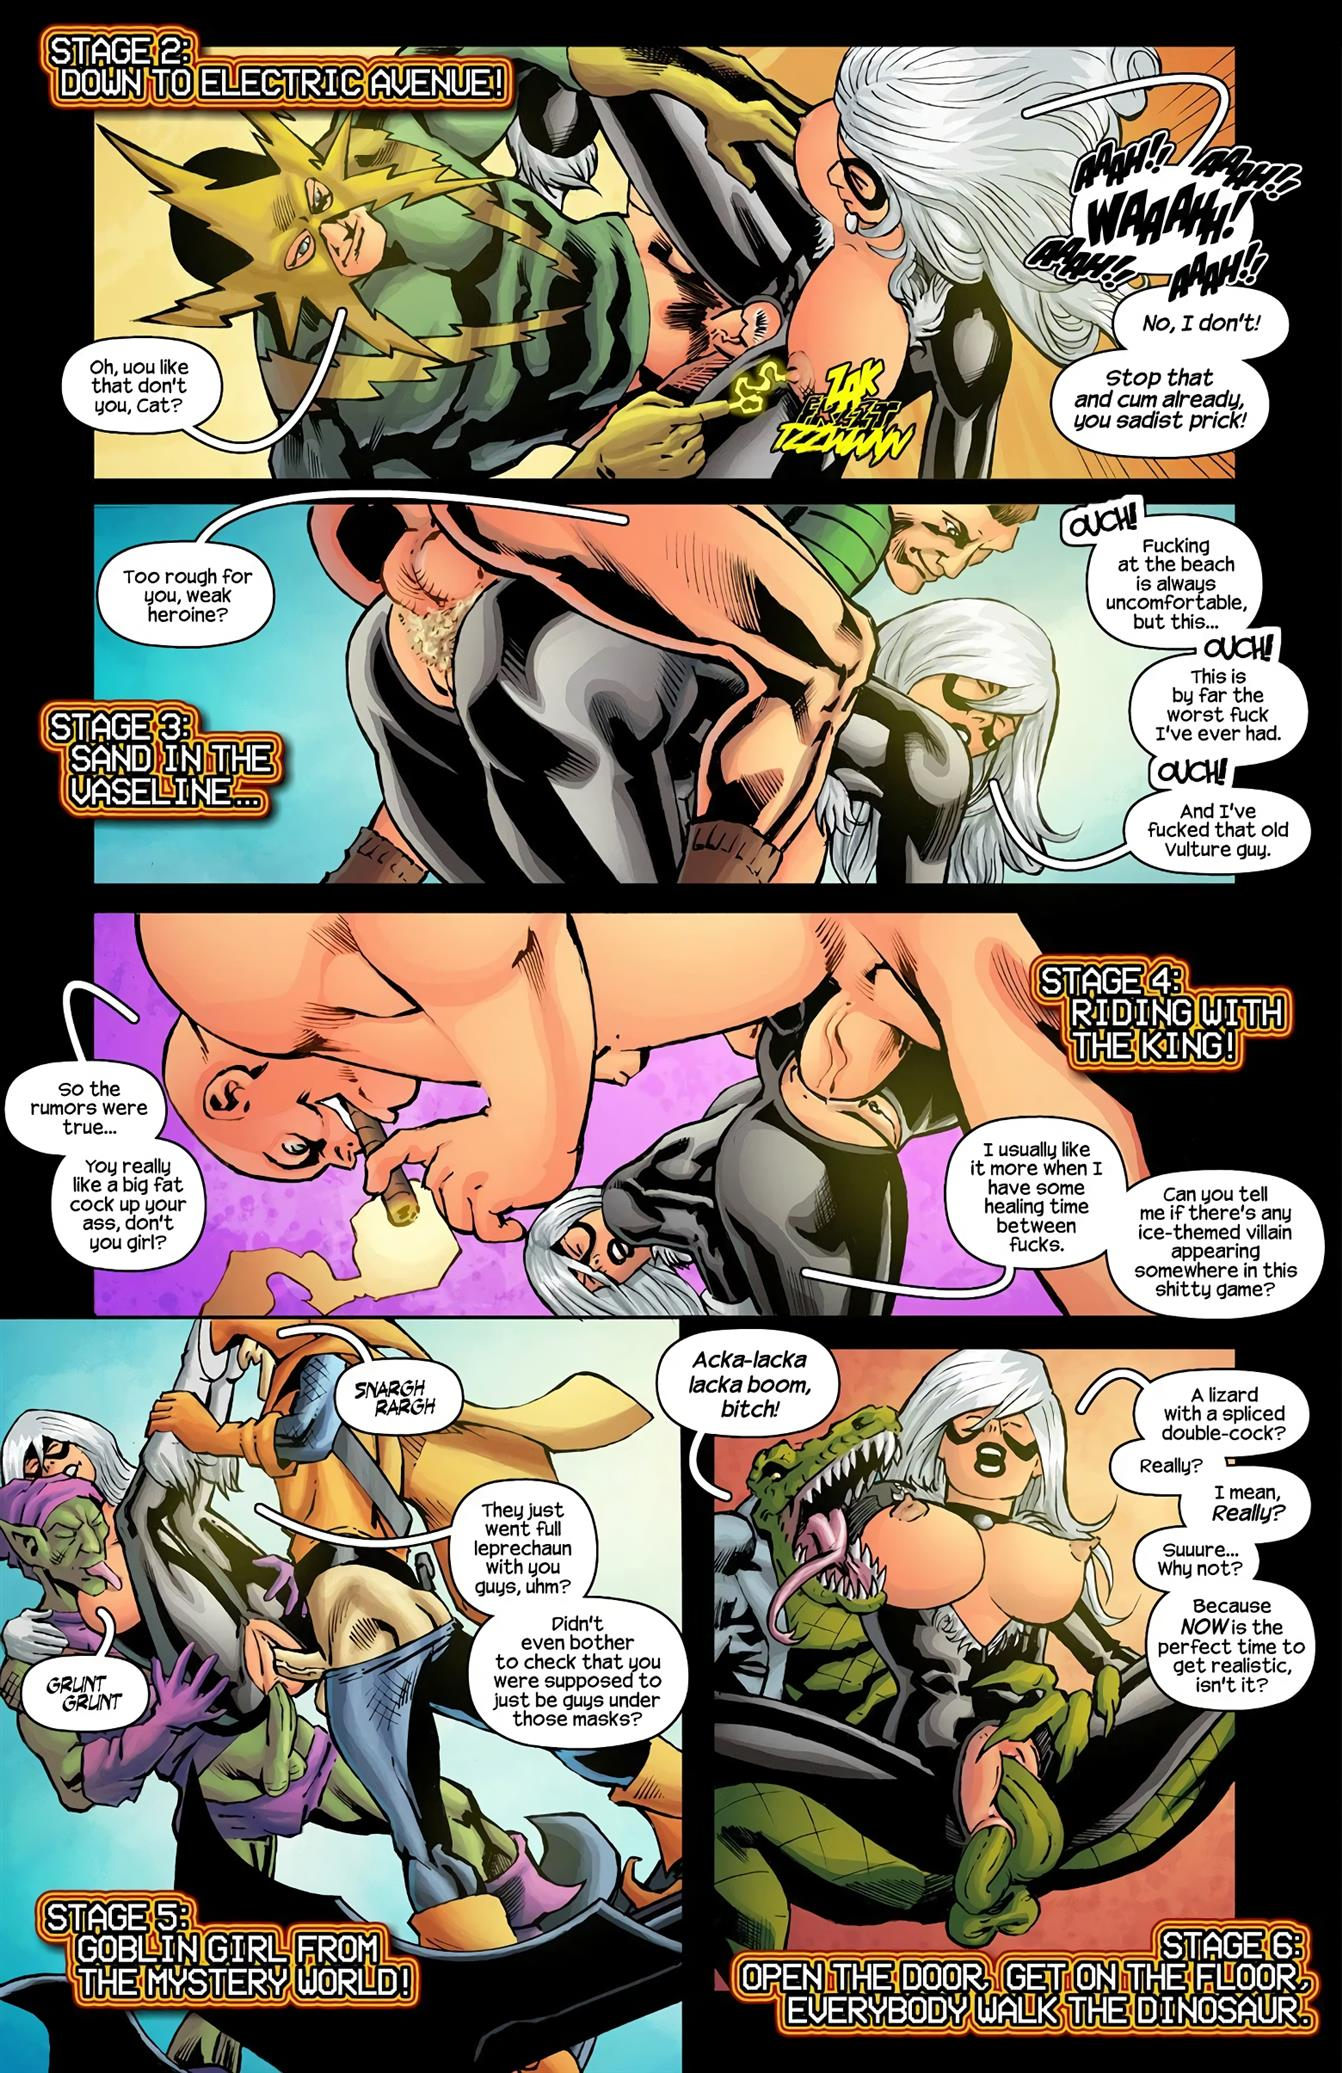 John Wolf – Spider-Man the '91 Arcade Video Game